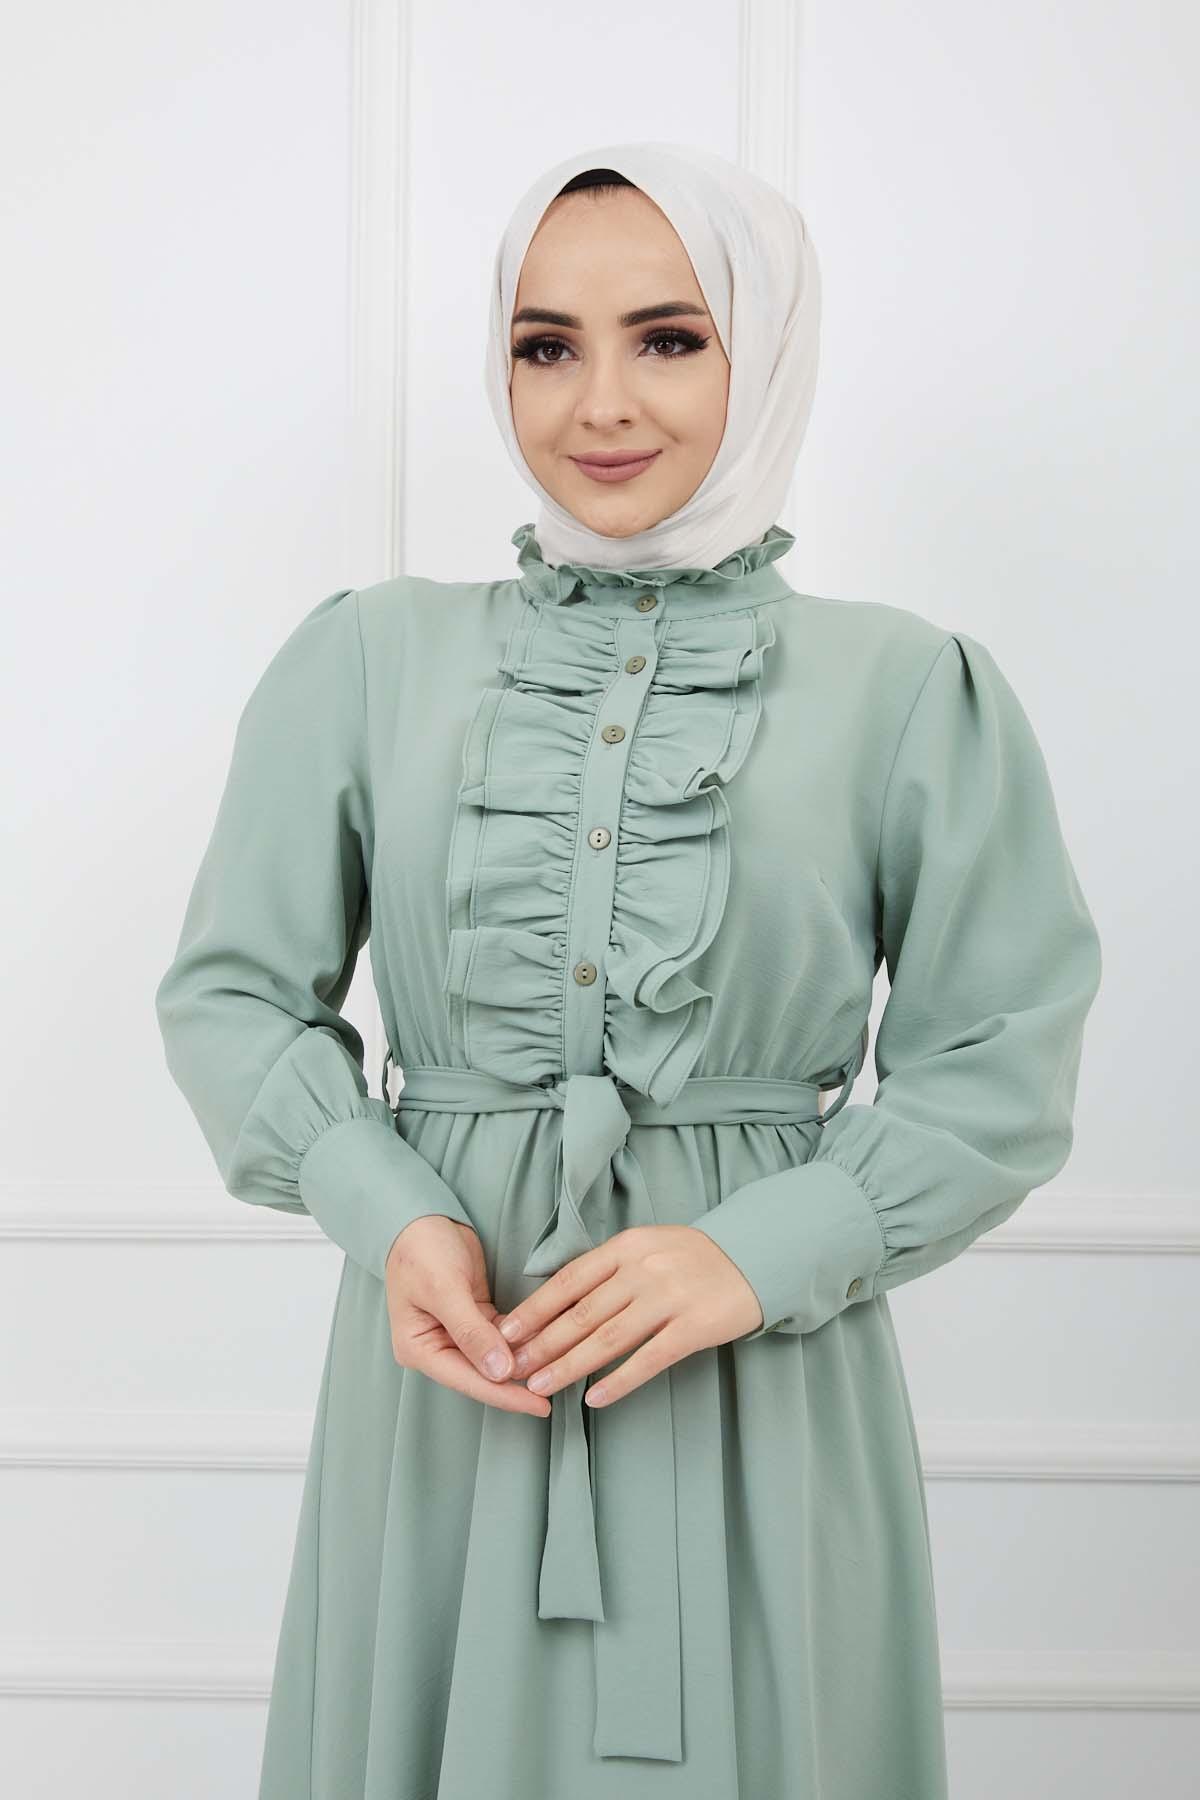 Önü Düğmeli Elbise - Mint Yeşili